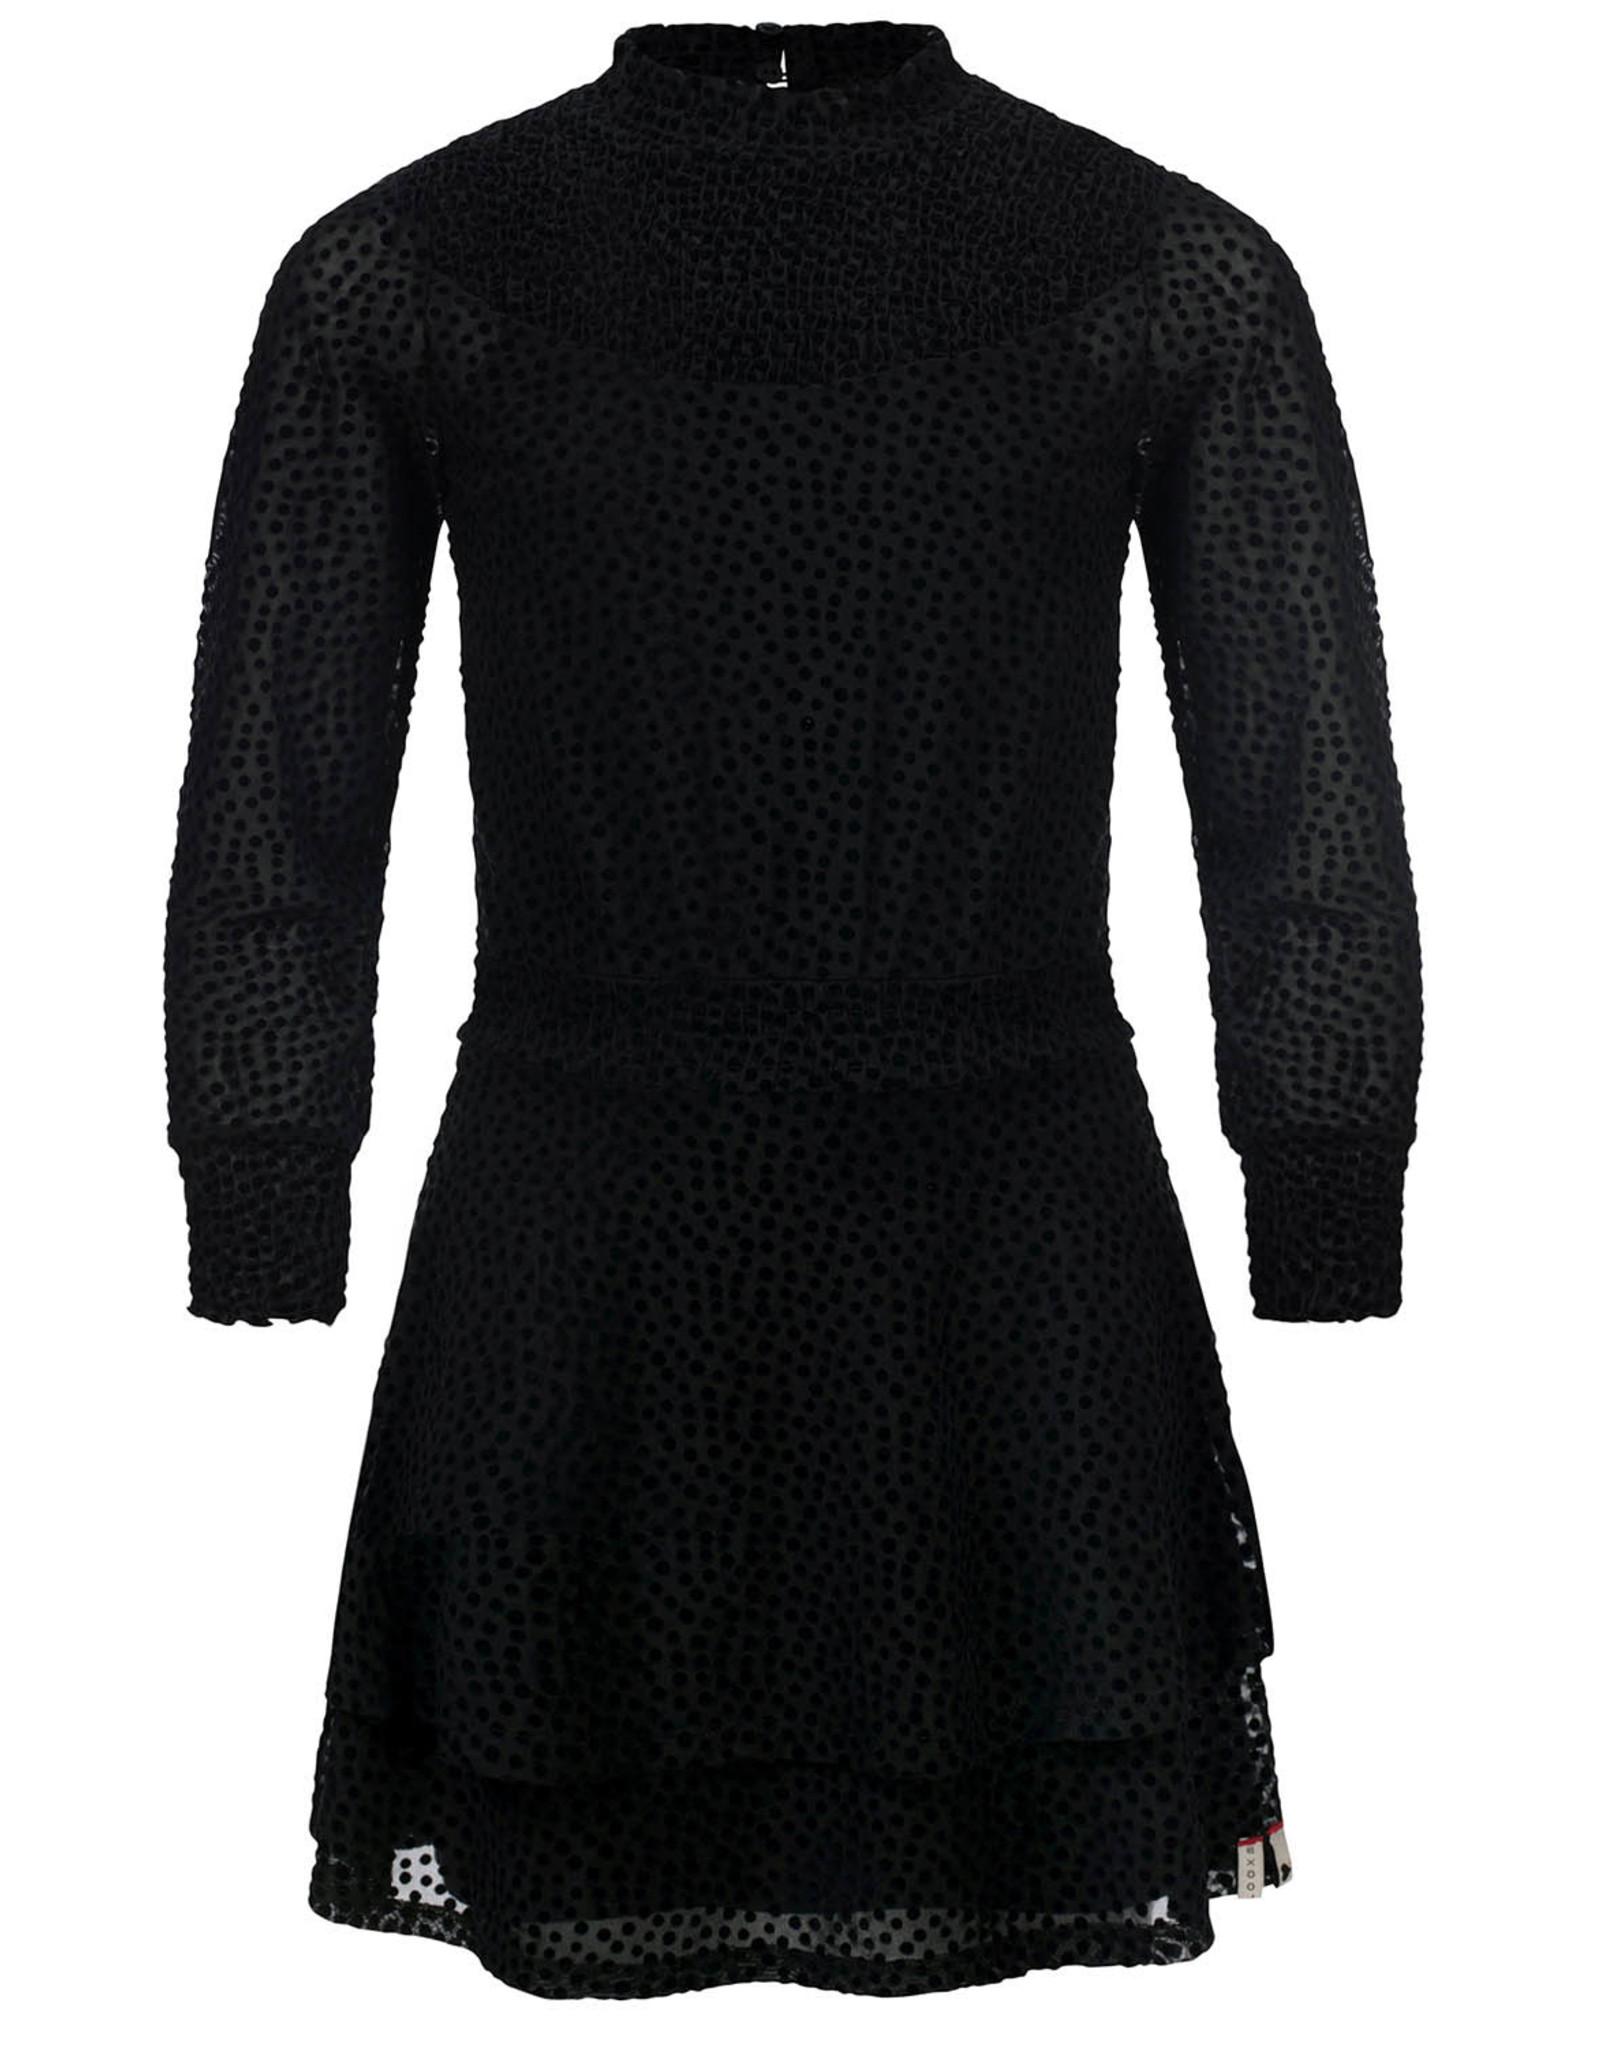 Looxs Girls dress Black